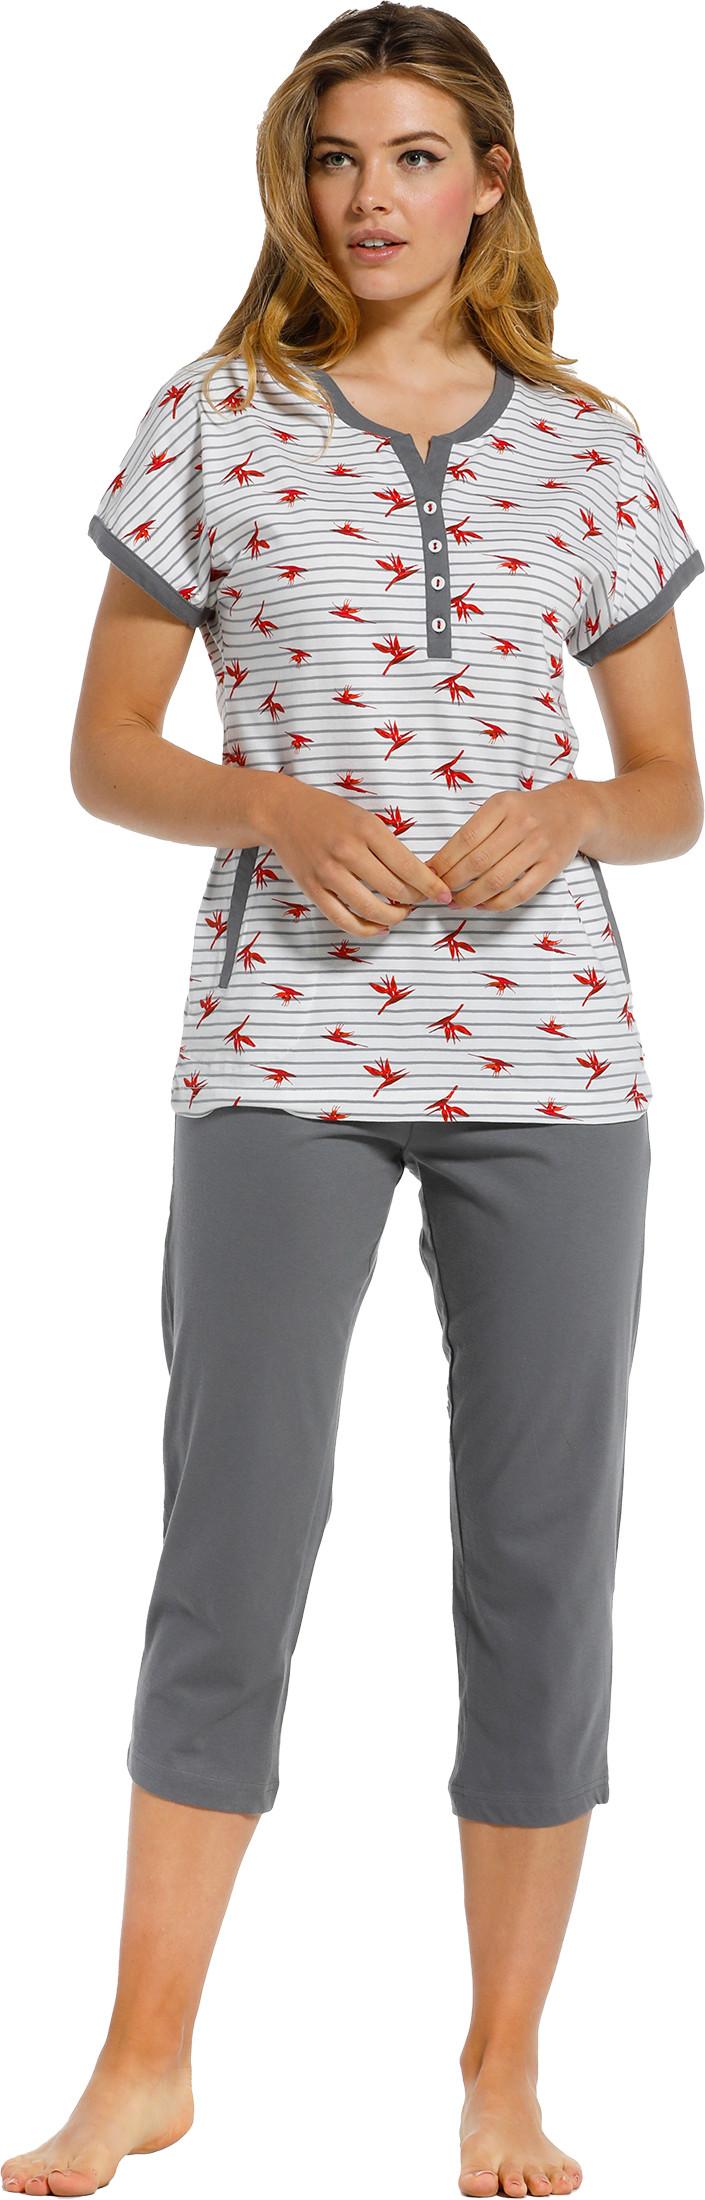 Dames pyjama Pastunette 20211-100-4-52